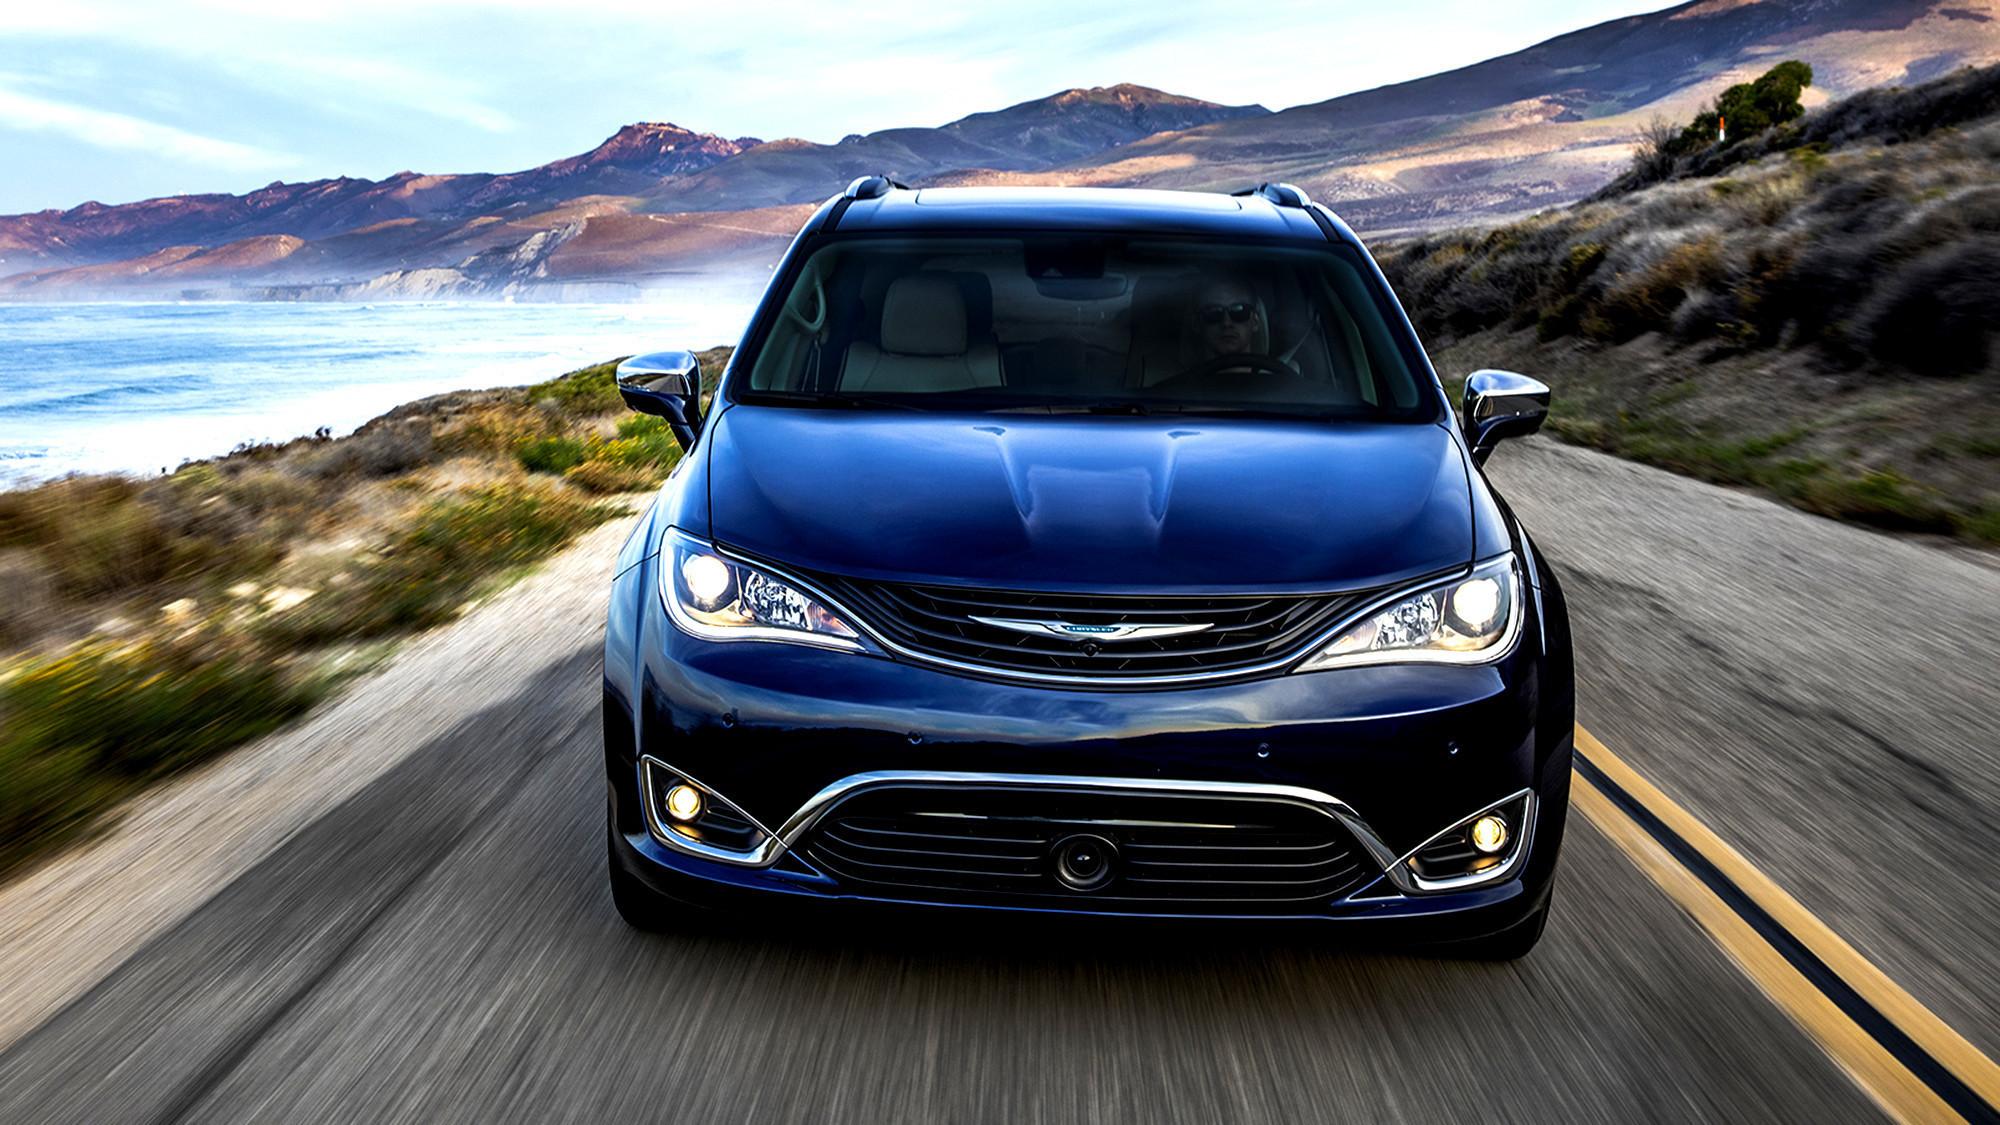 2017 chrysler pacifica america 39 s first plug in hybrid minivan la times. Black Bedroom Furniture Sets. Home Design Ideas